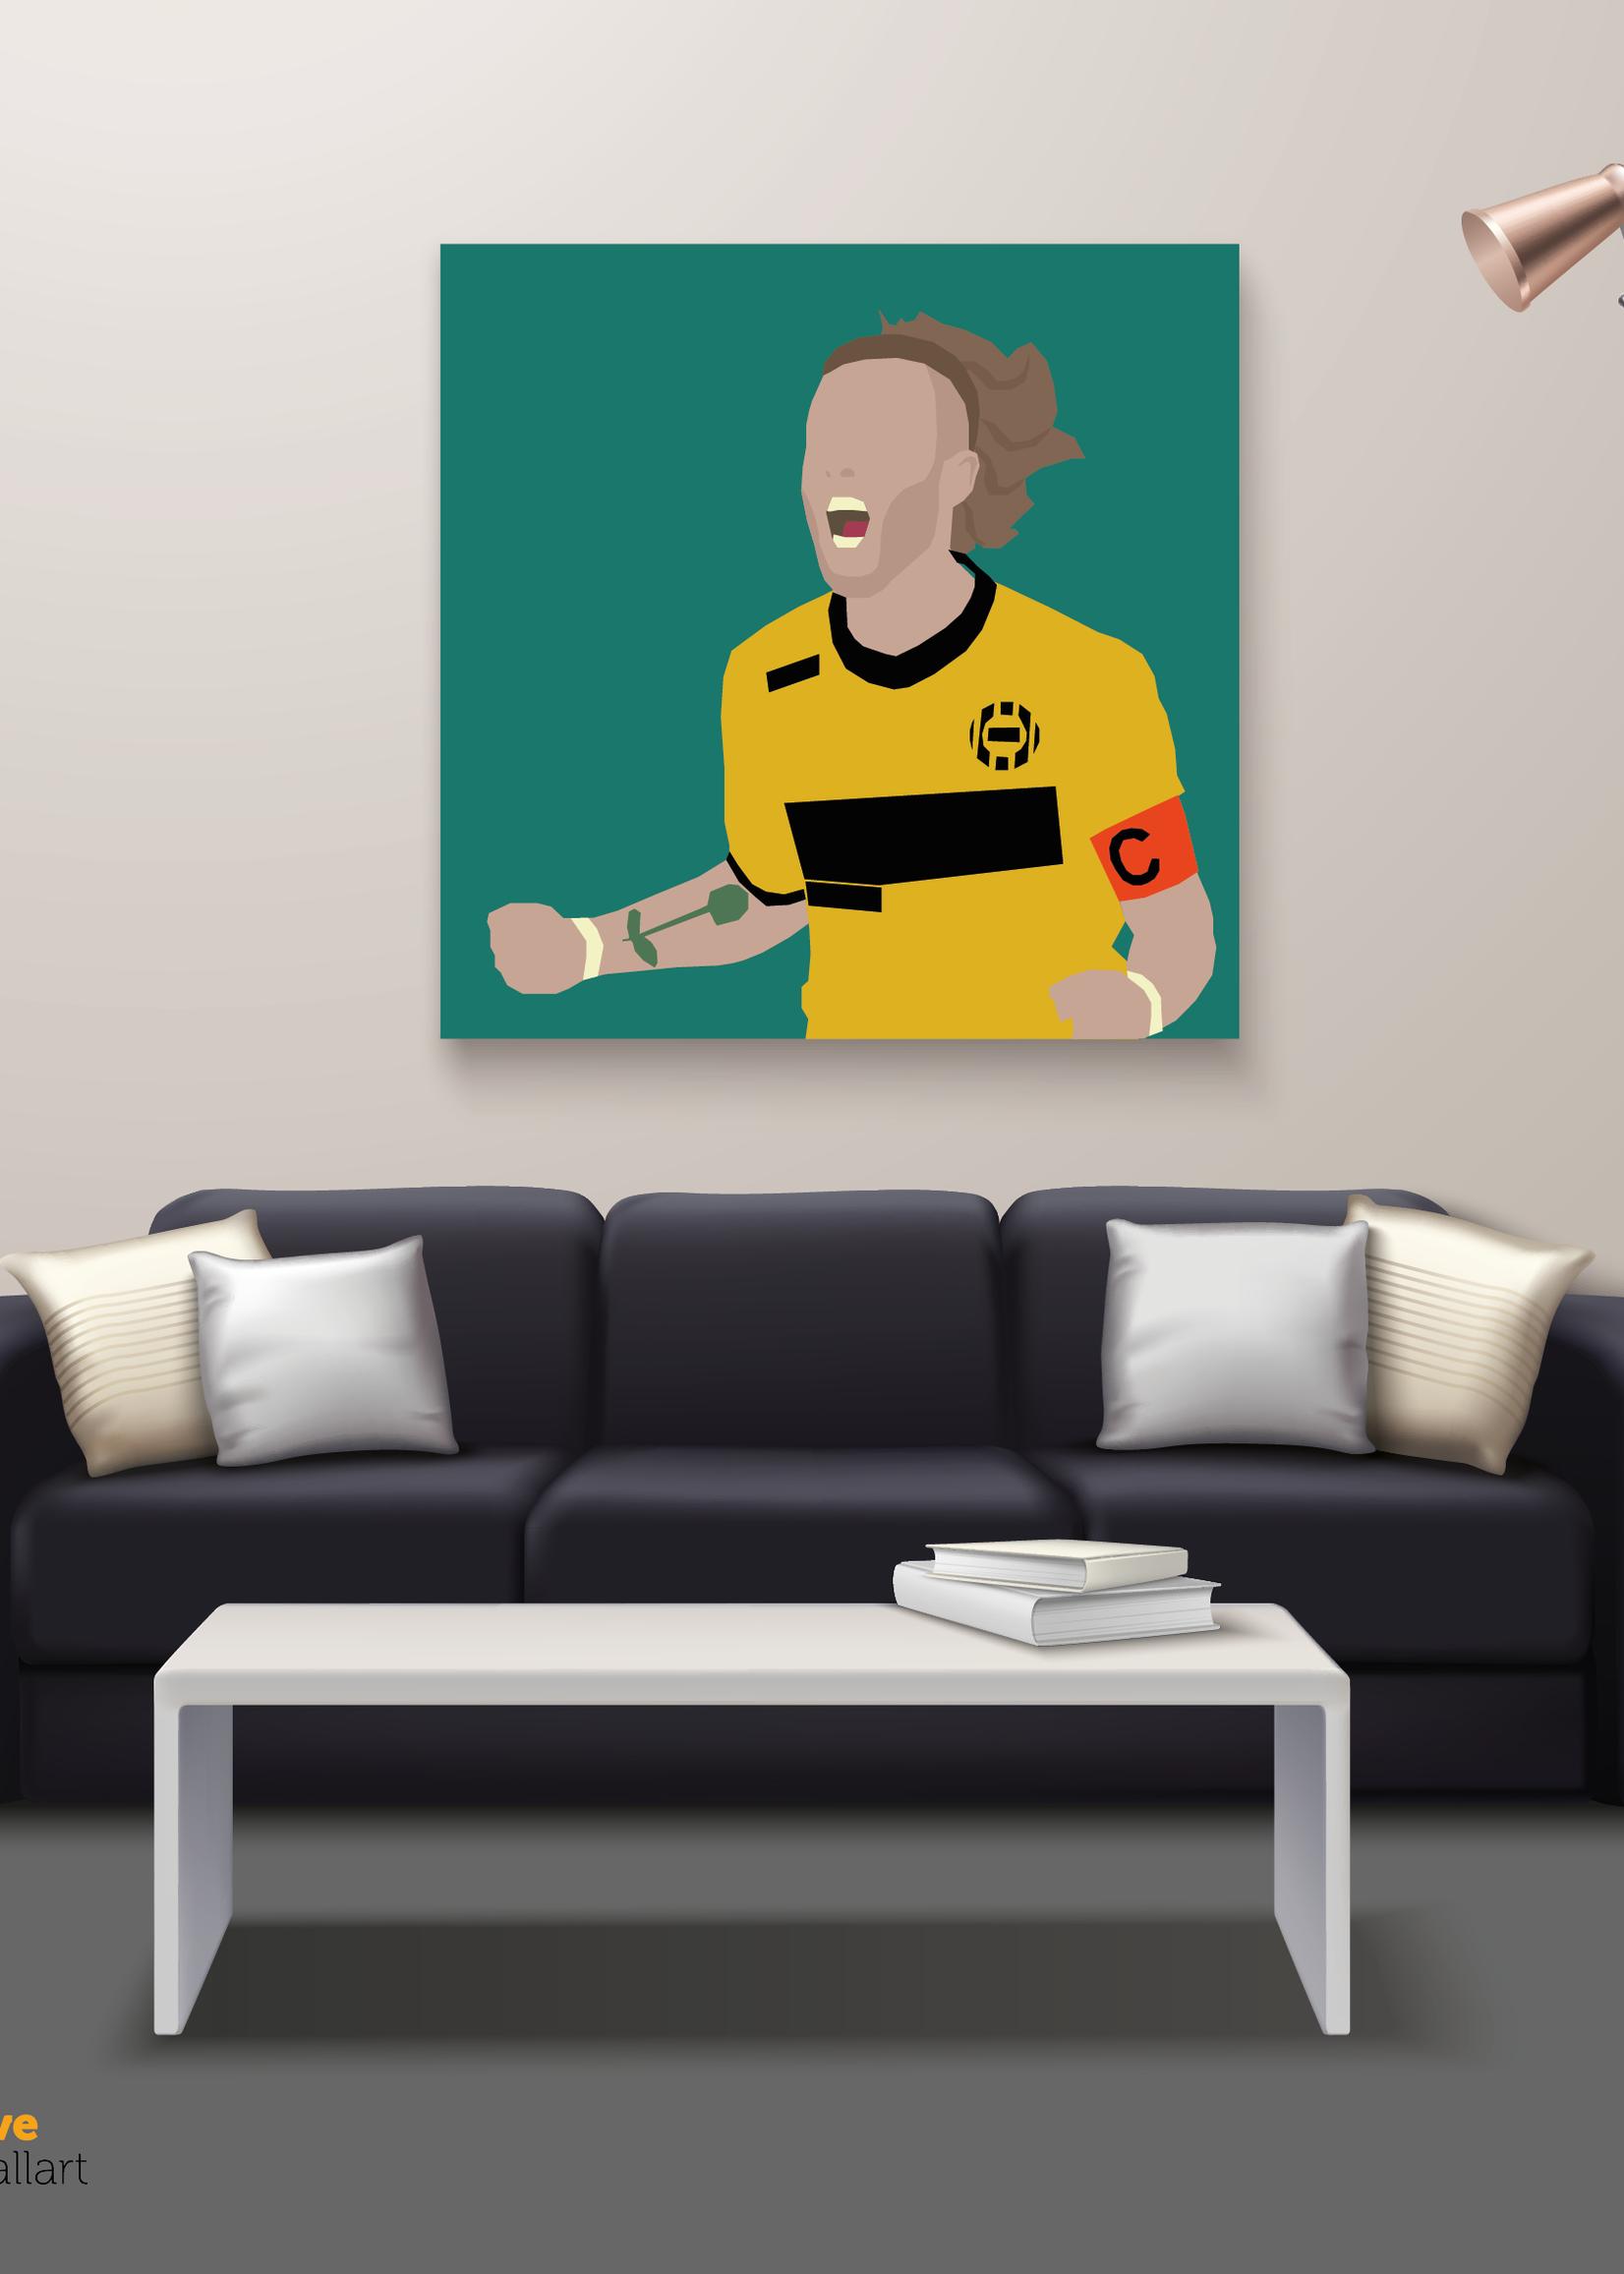 "We Love Football Art ""Jungen, was sind wir glücklich"" We Love Football Art"